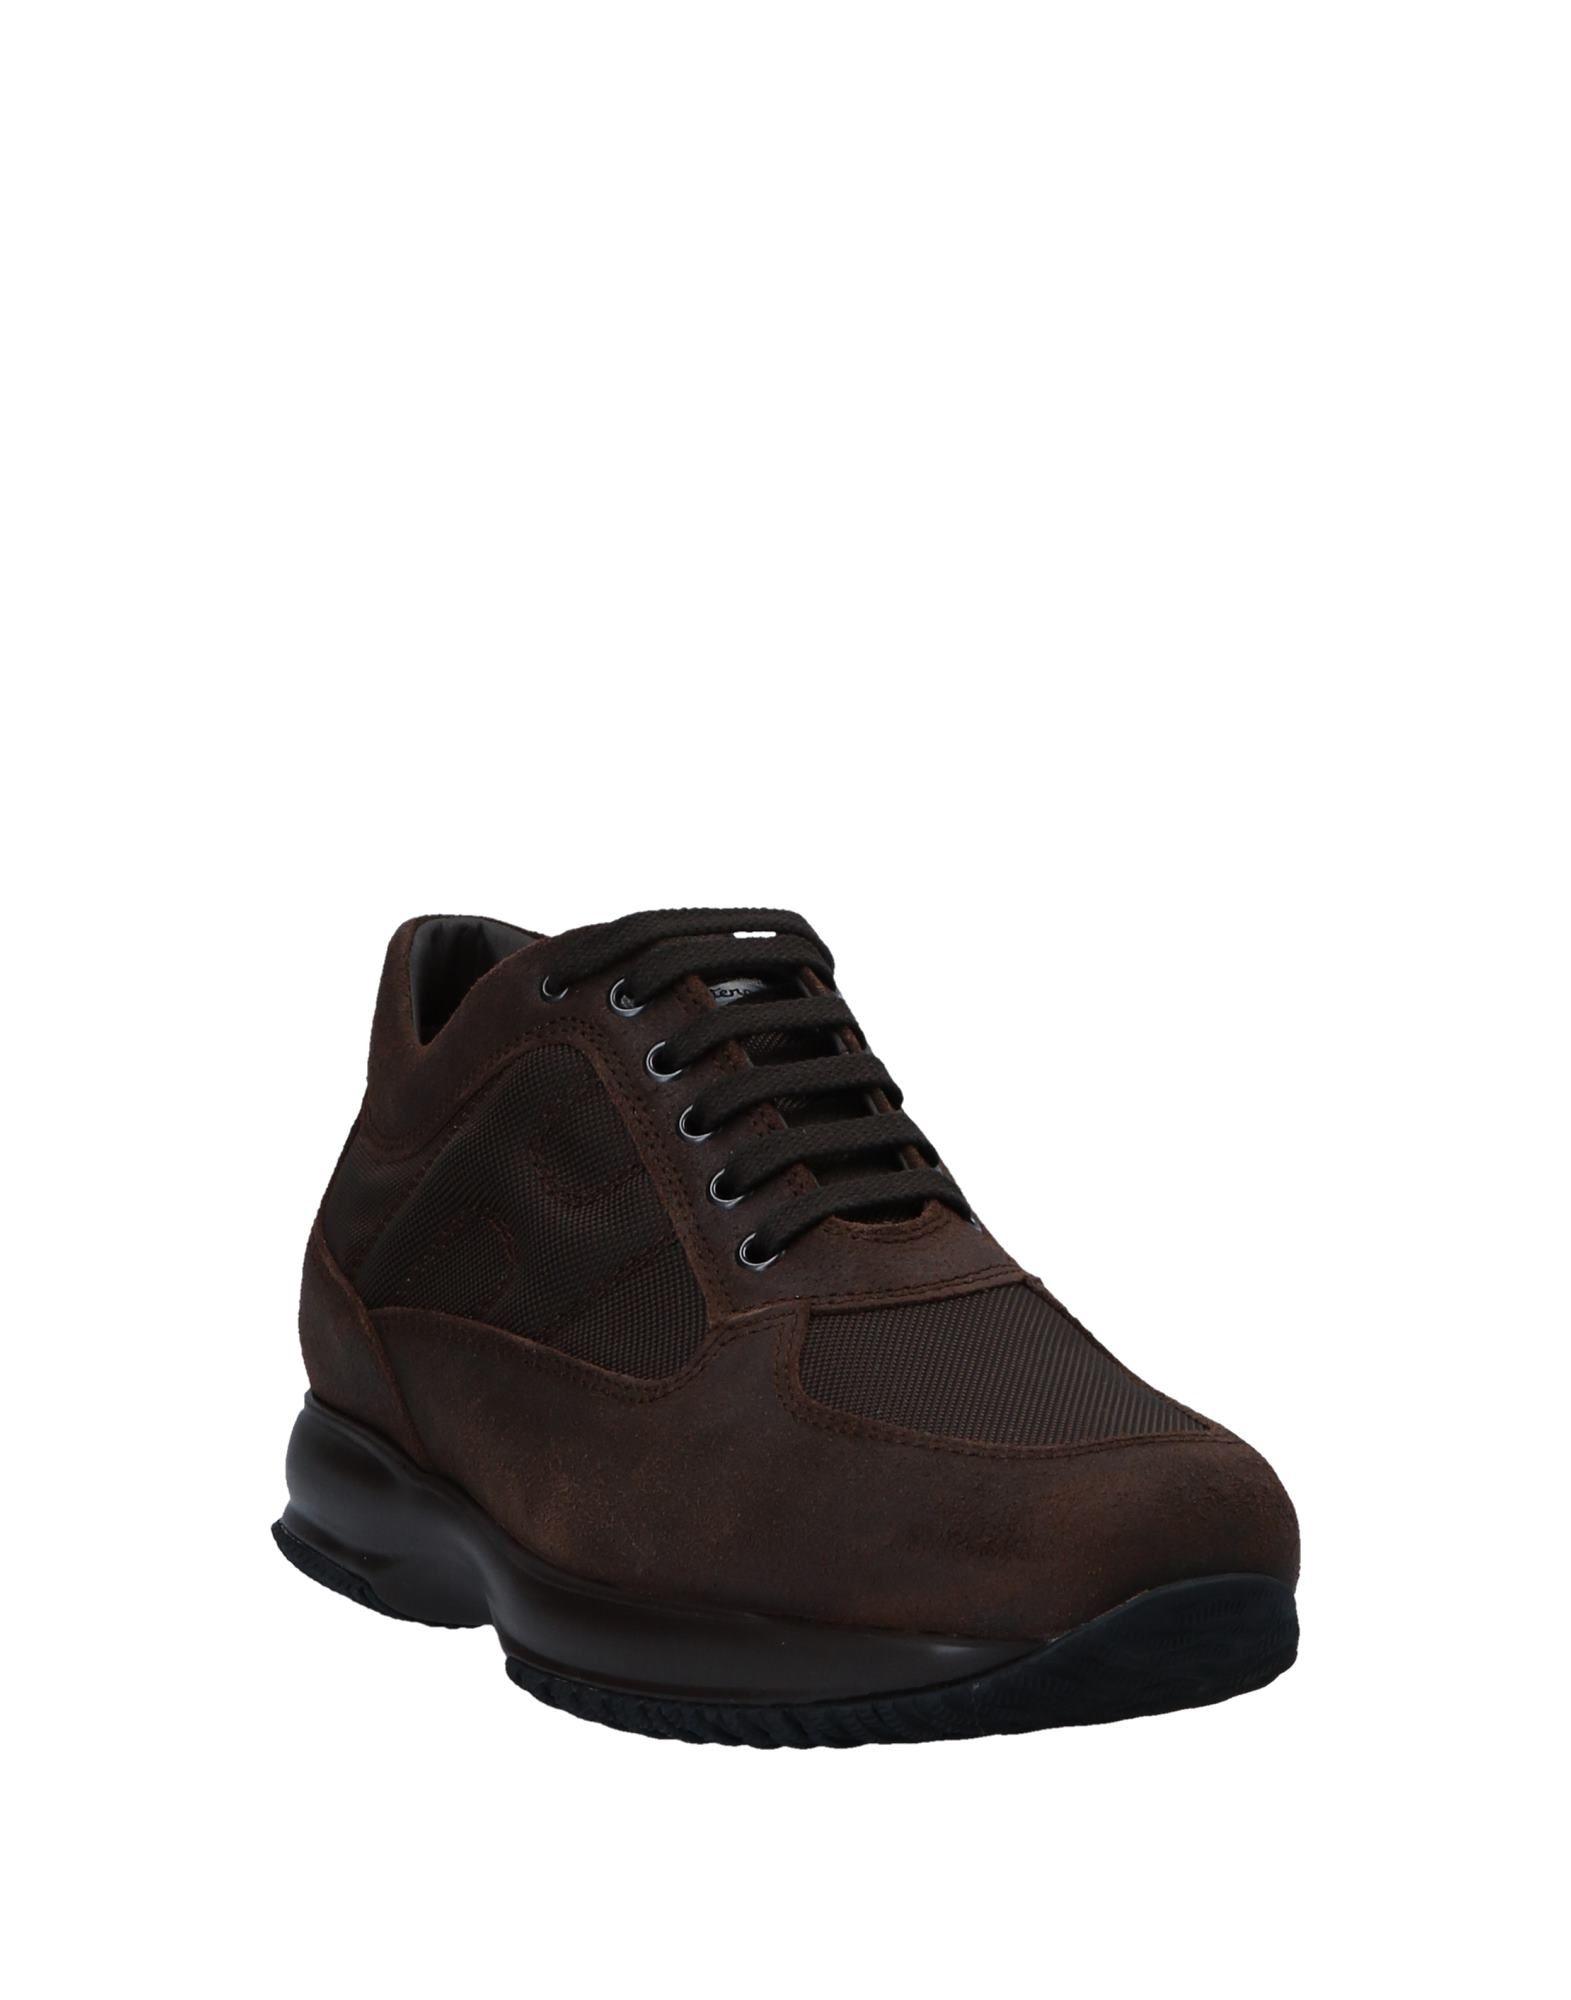 Hogan 11556098LF Sneakers Herren  11556098LF Hogan Gute Qualität beliebte Schuhe bc7013